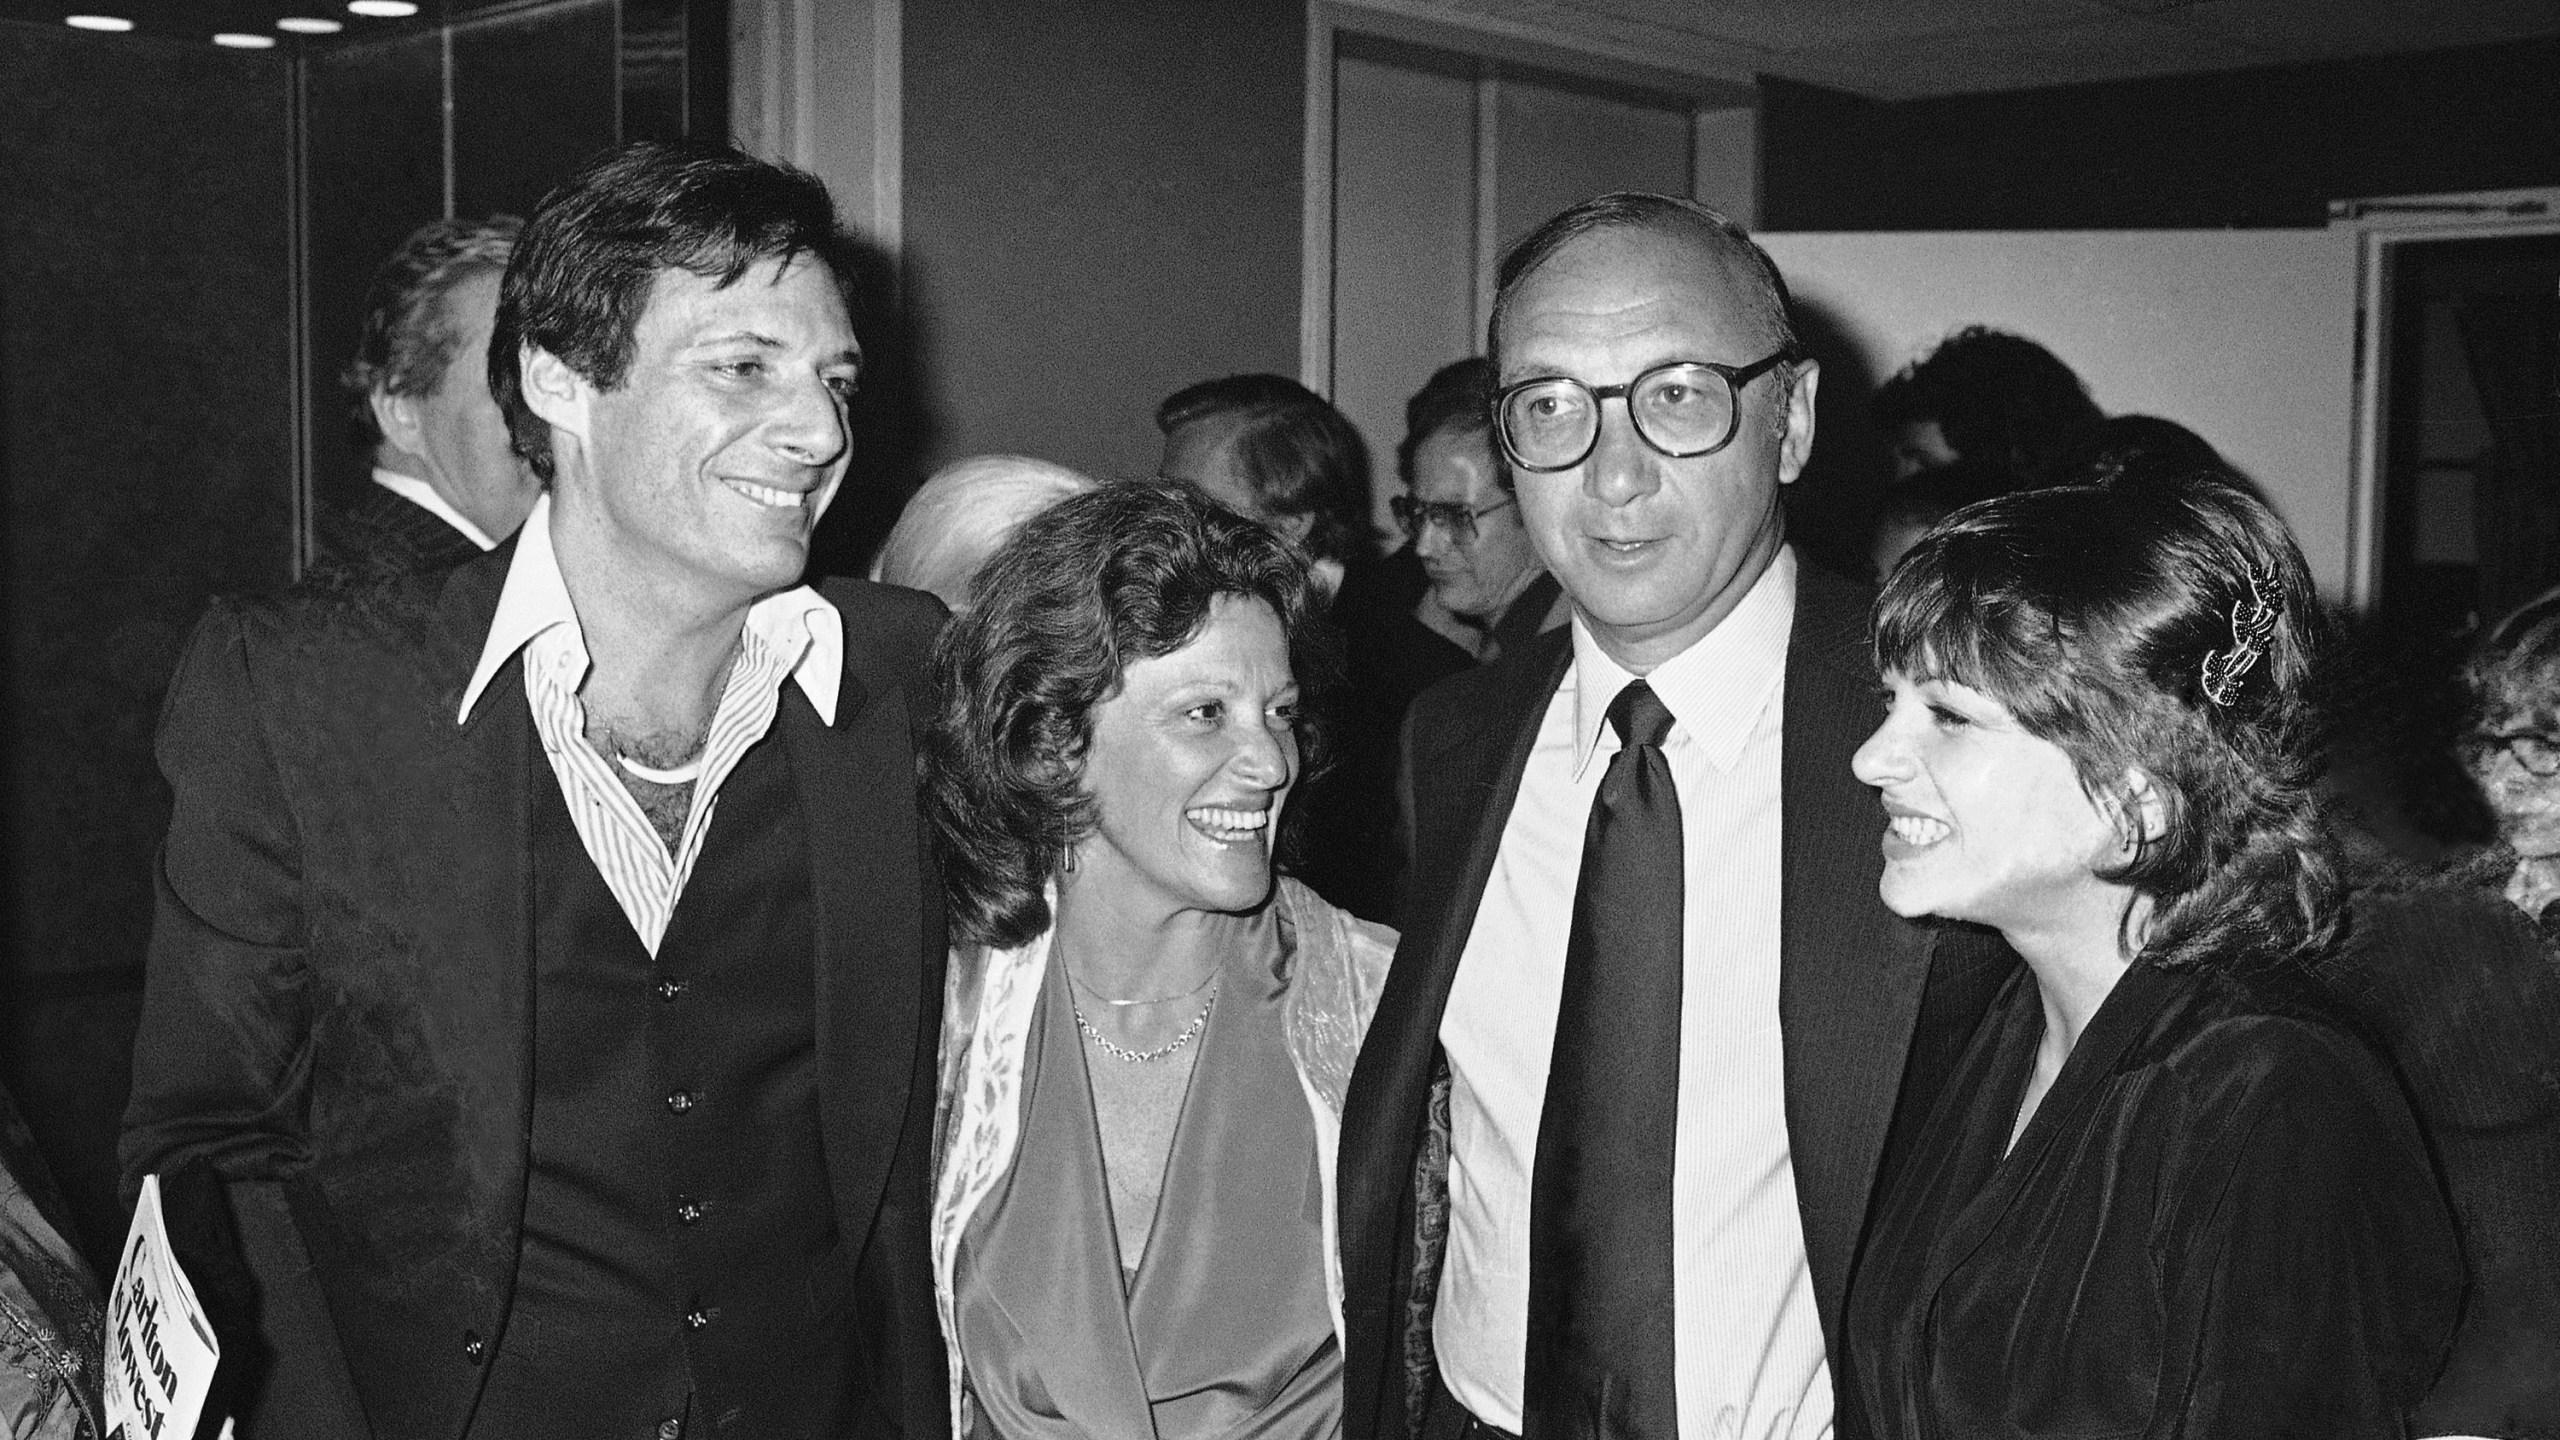 Ron Leibman, Dinah Manoff, Neil Simon, Linda Lavin